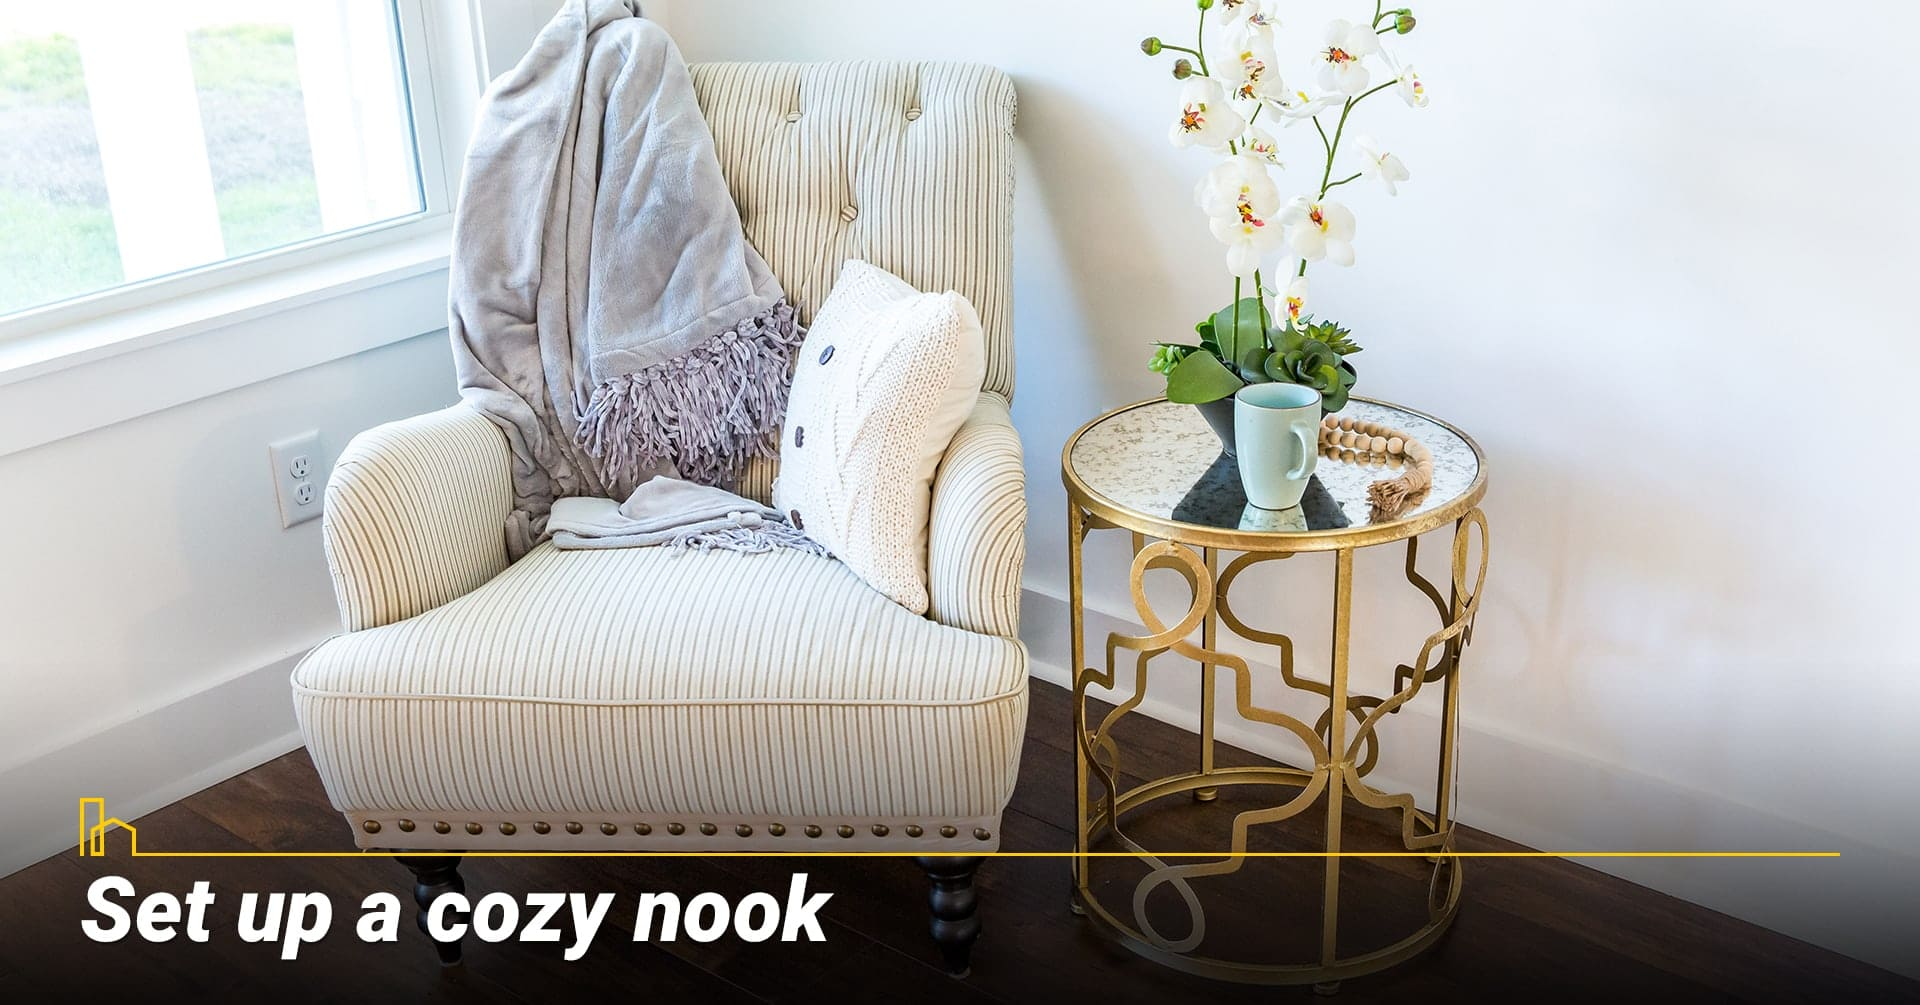 Set up a cozy nook, designate a corner for relaxation